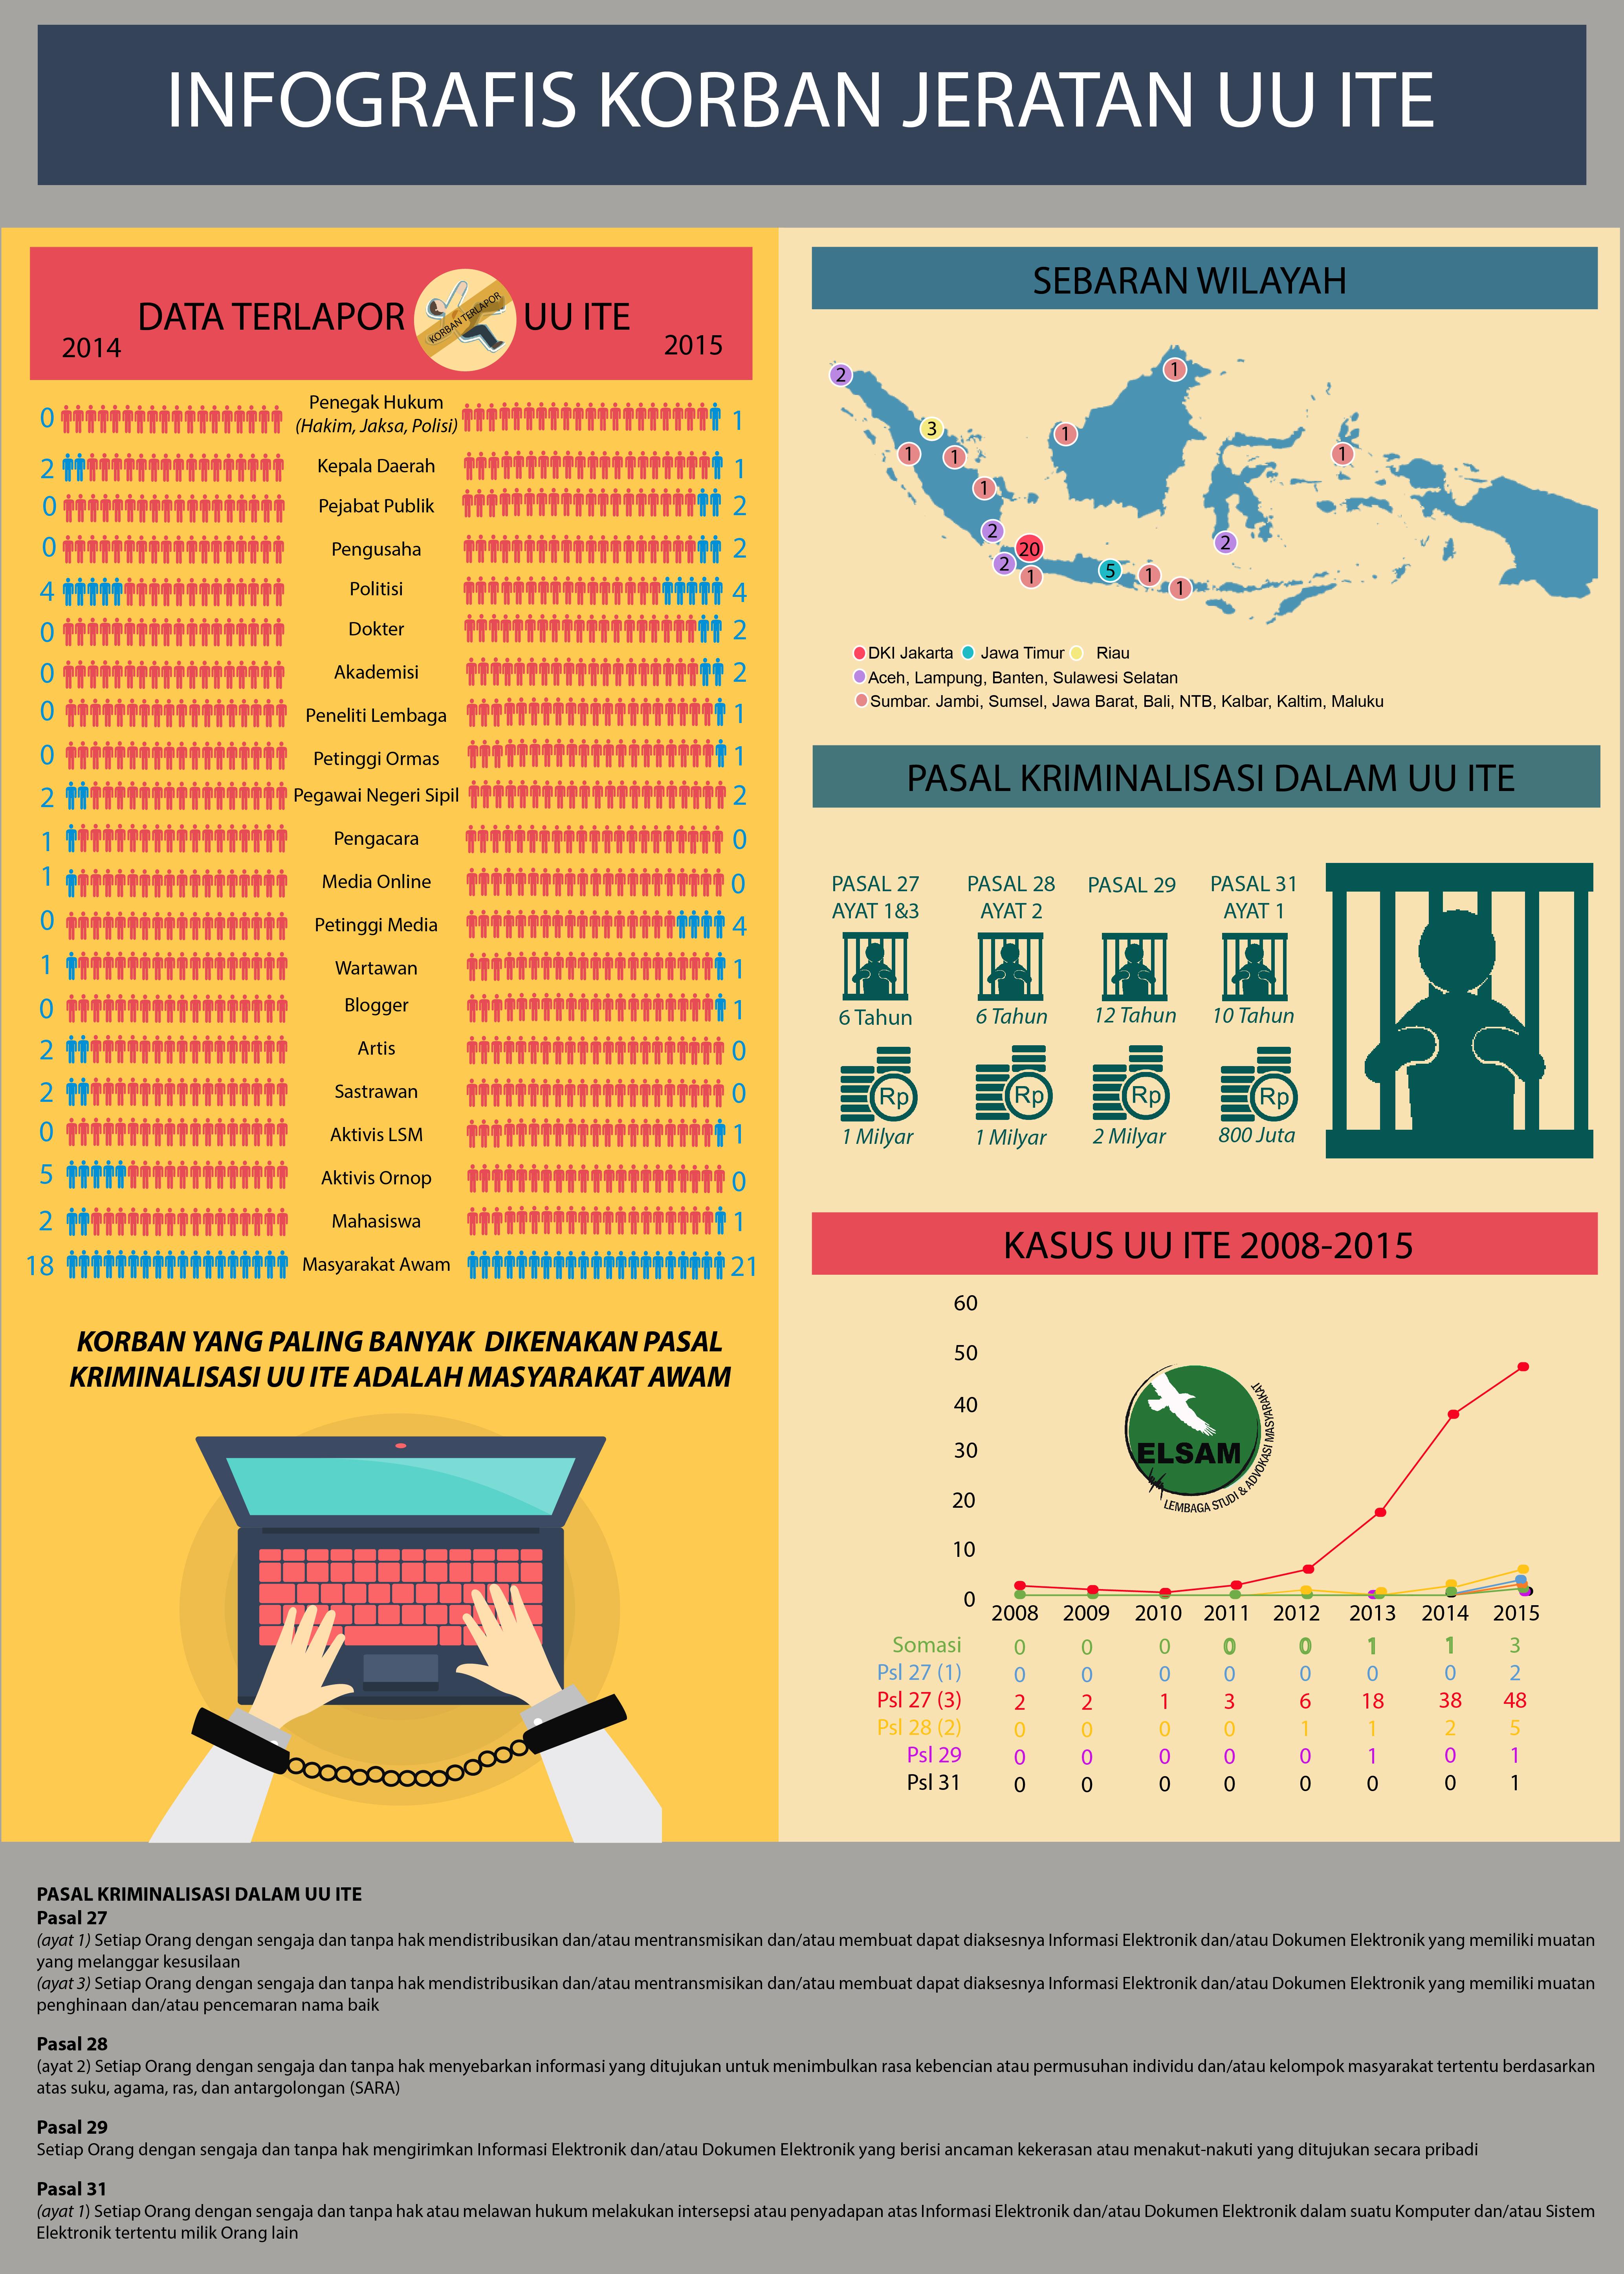 Infografis Korban Jeratan UU ITE-01